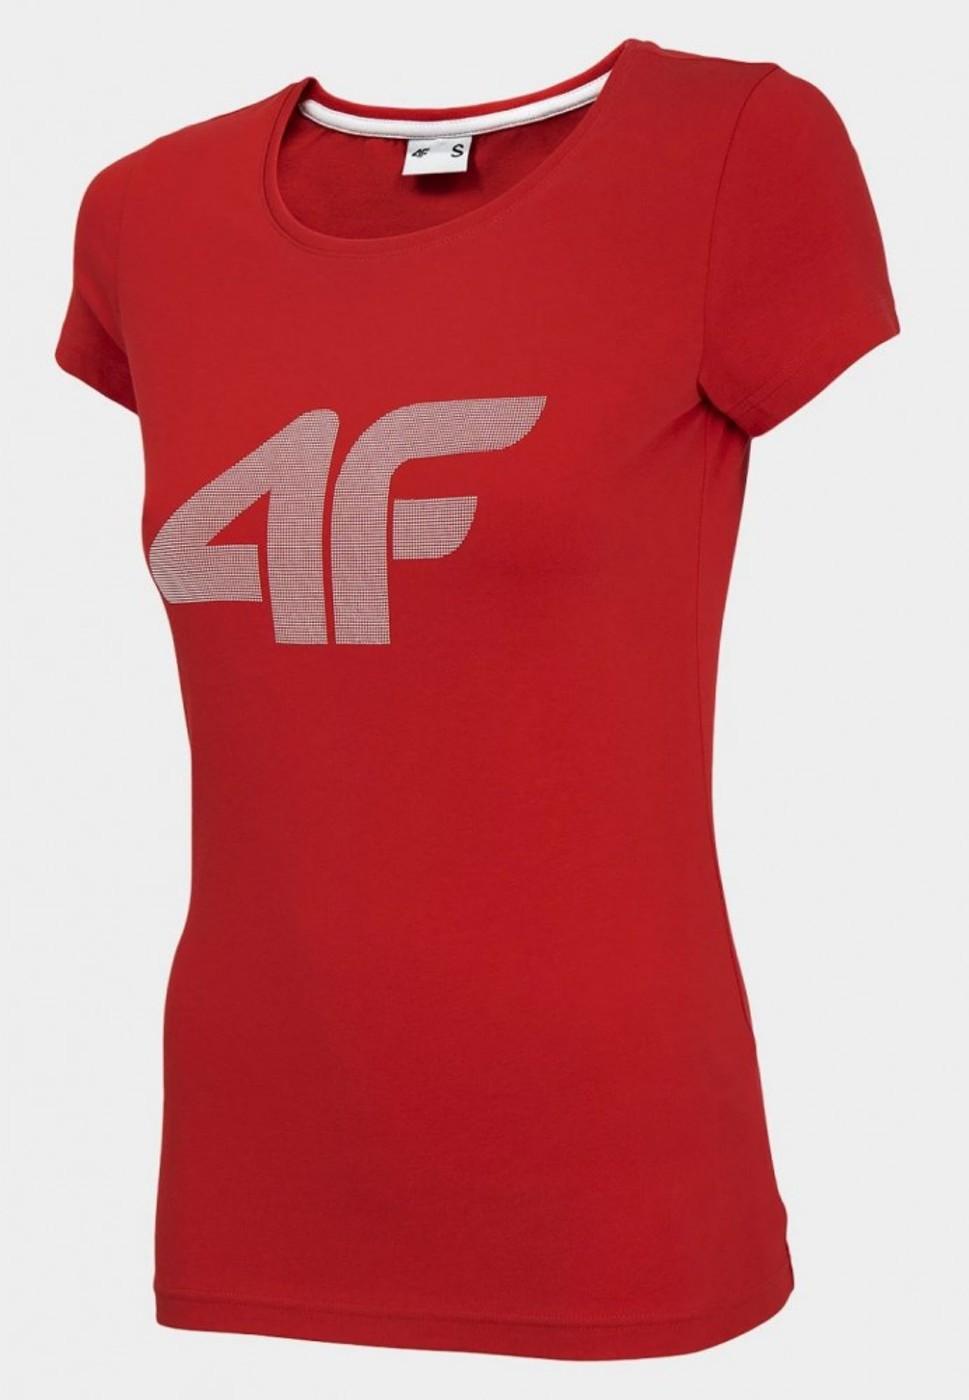 4F TSD005 T-Shirt - Damen